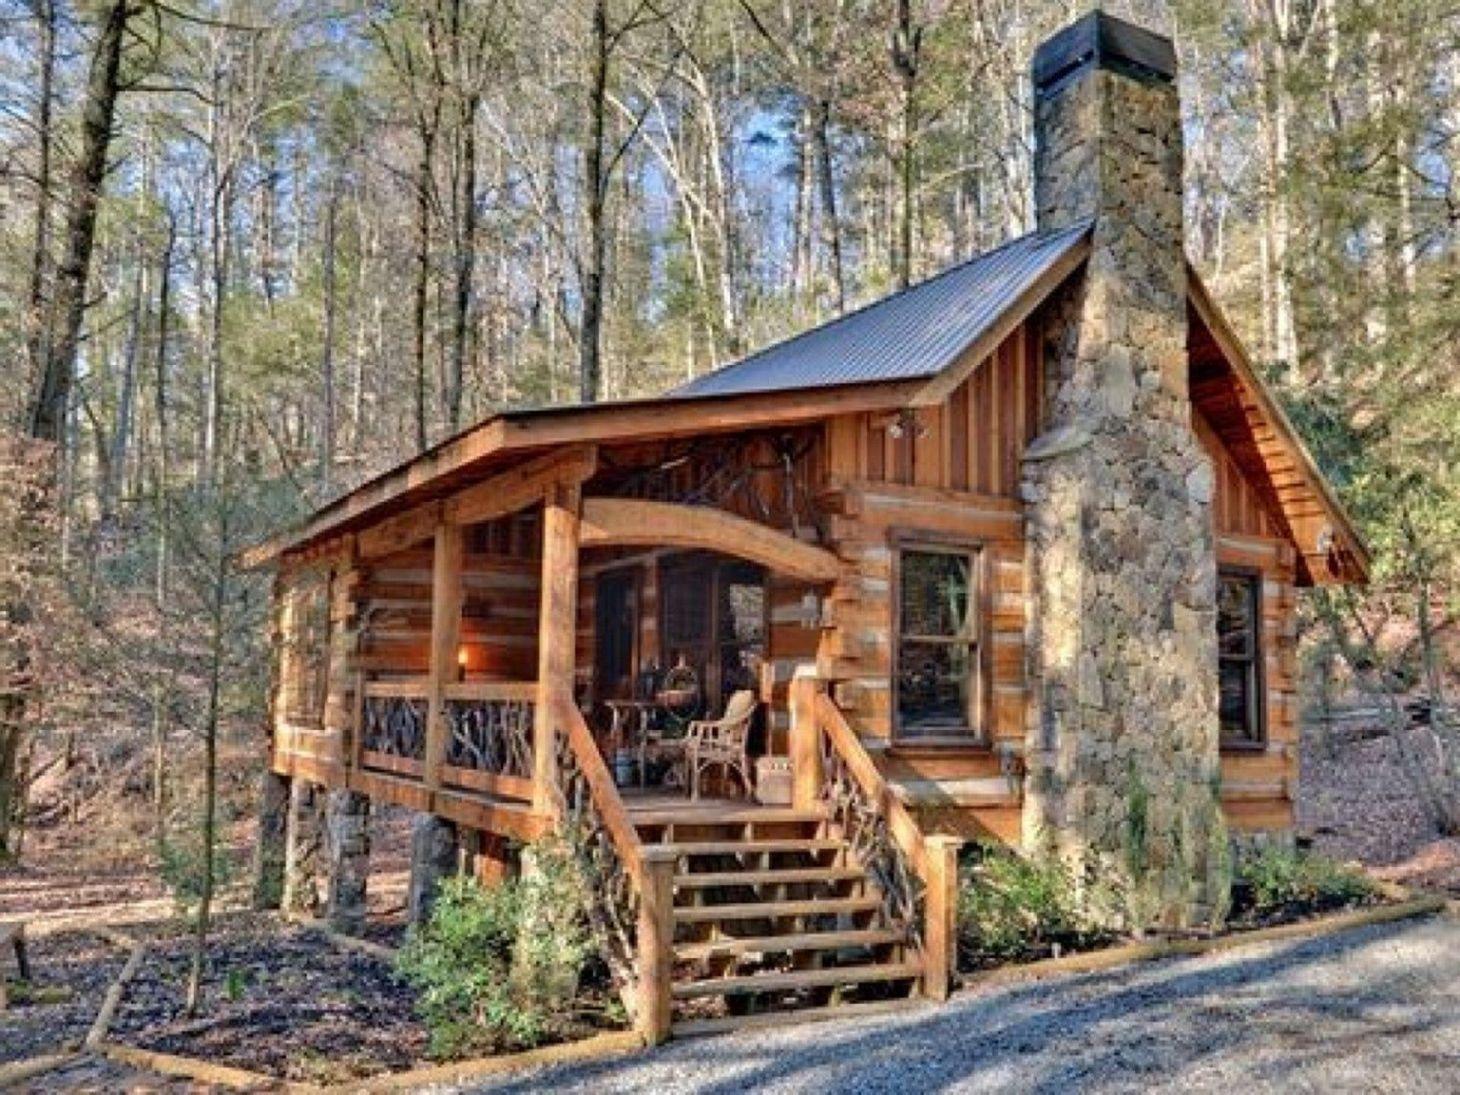 Small Log Home Design Ideas 15 Small Log Homes Small Cabin Interiors Log Home Designs